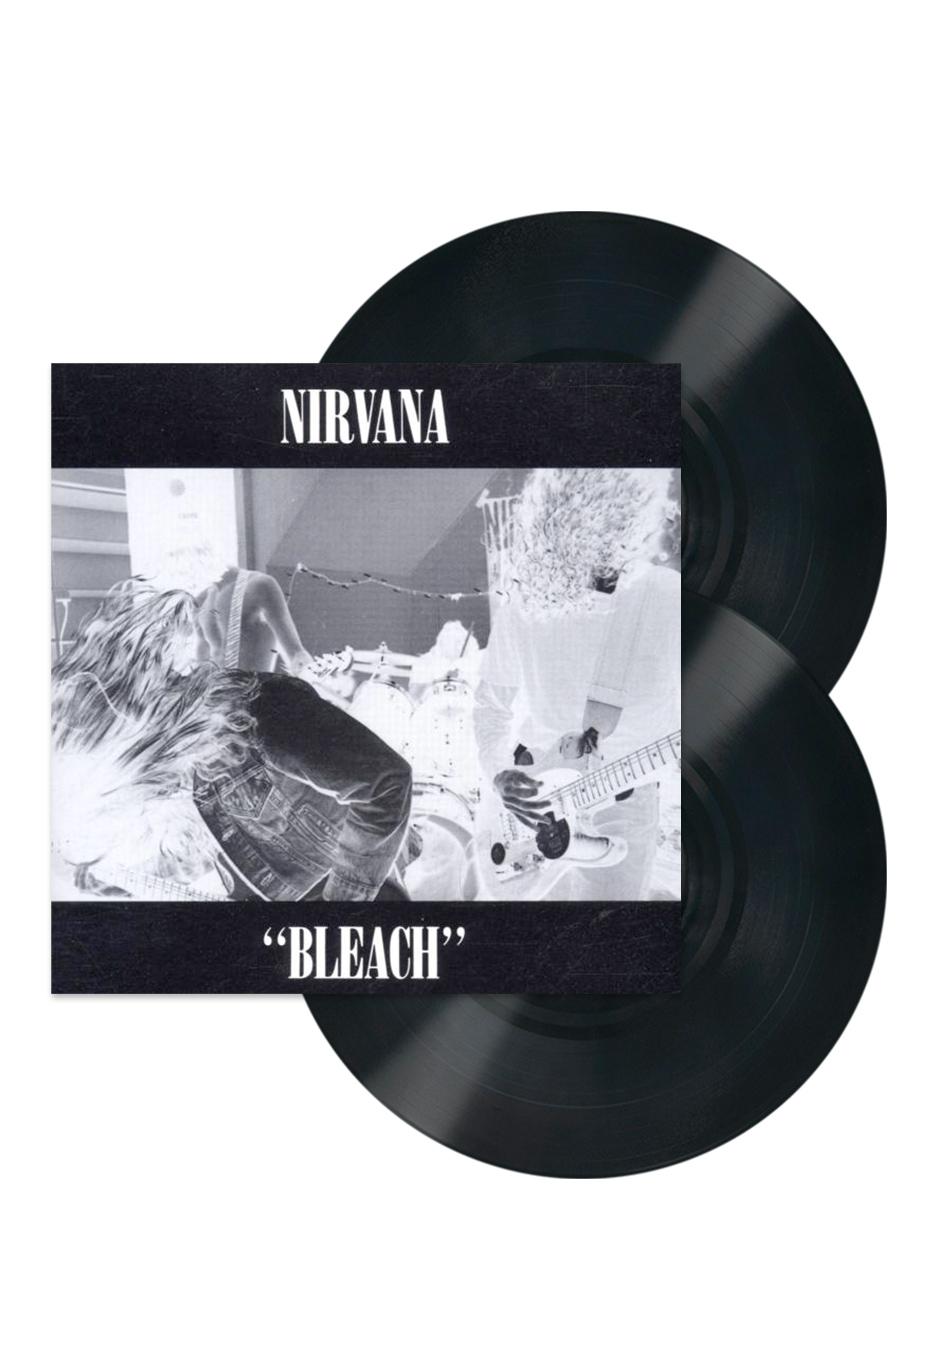 Nirvana - Bleach Deluxe Edition - Vinyl